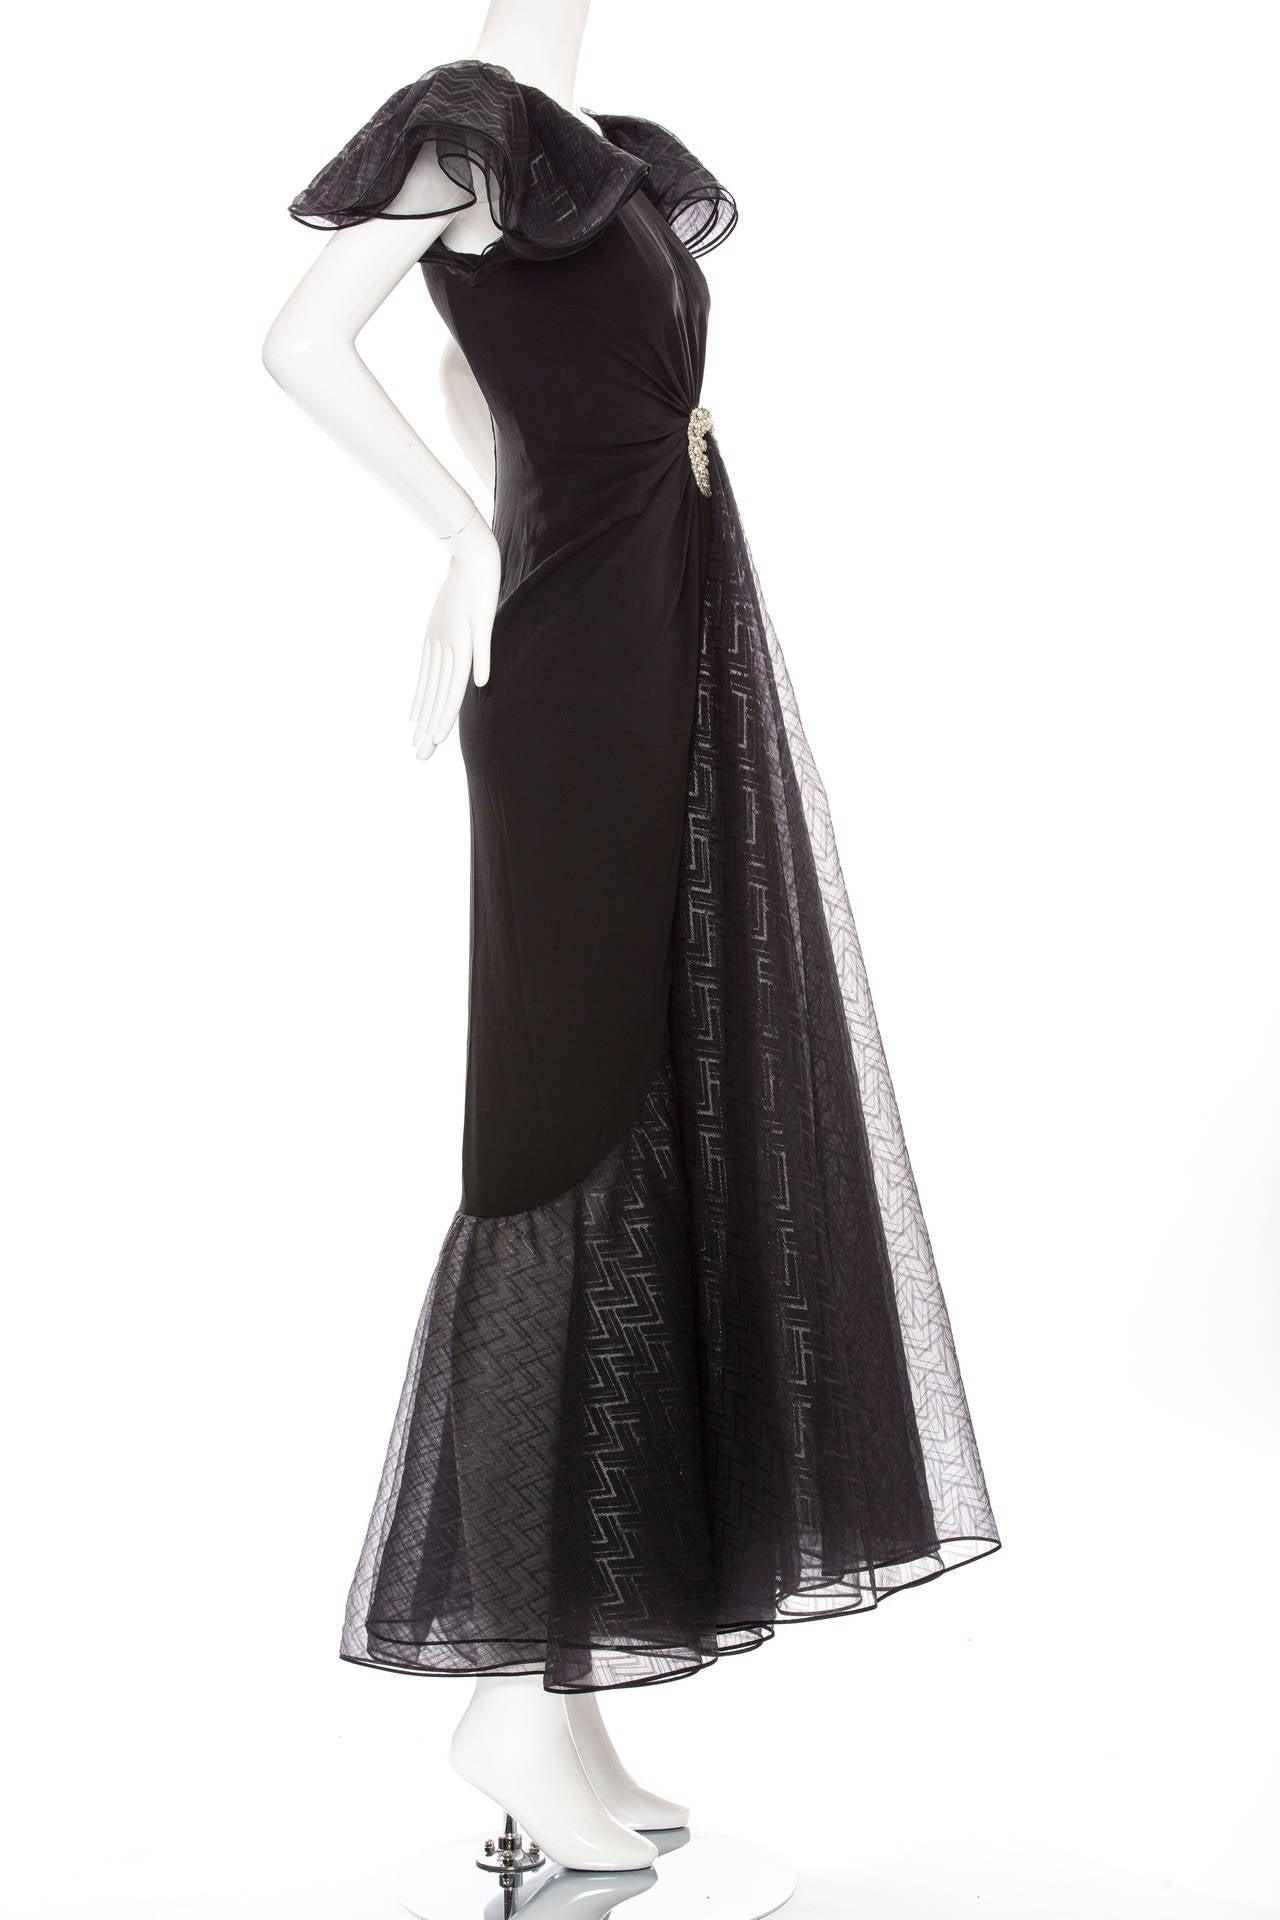 Valentino Haute Couture Silk Crepe And Printed Gazar Evening Dress, Circa 1980's 3